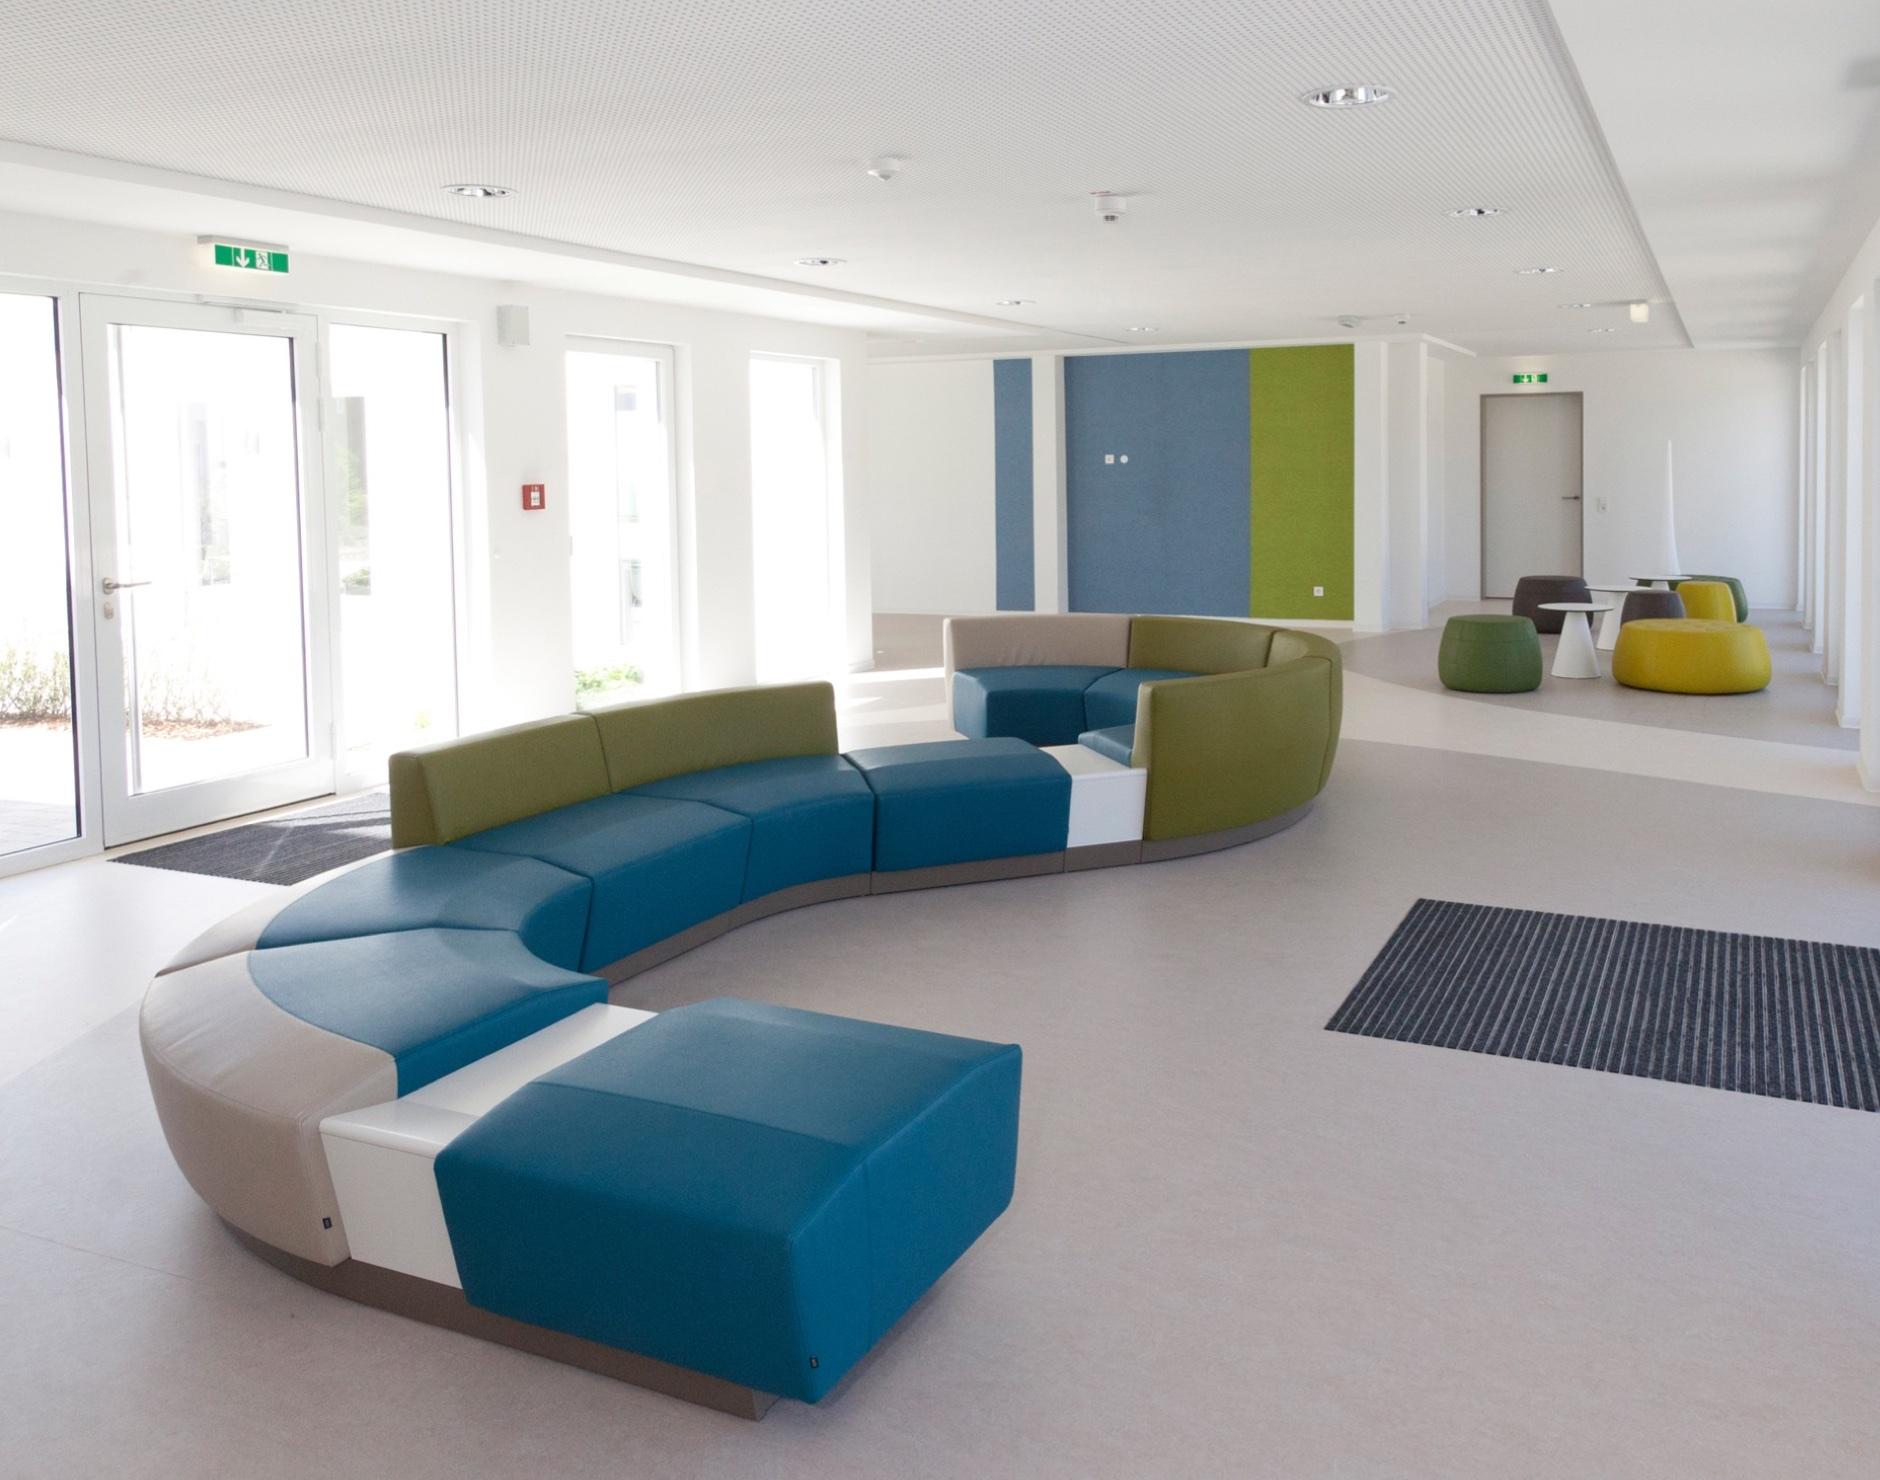 clinica las condes cor. Black Bedroom Furniture Sets. Home Design Ideas